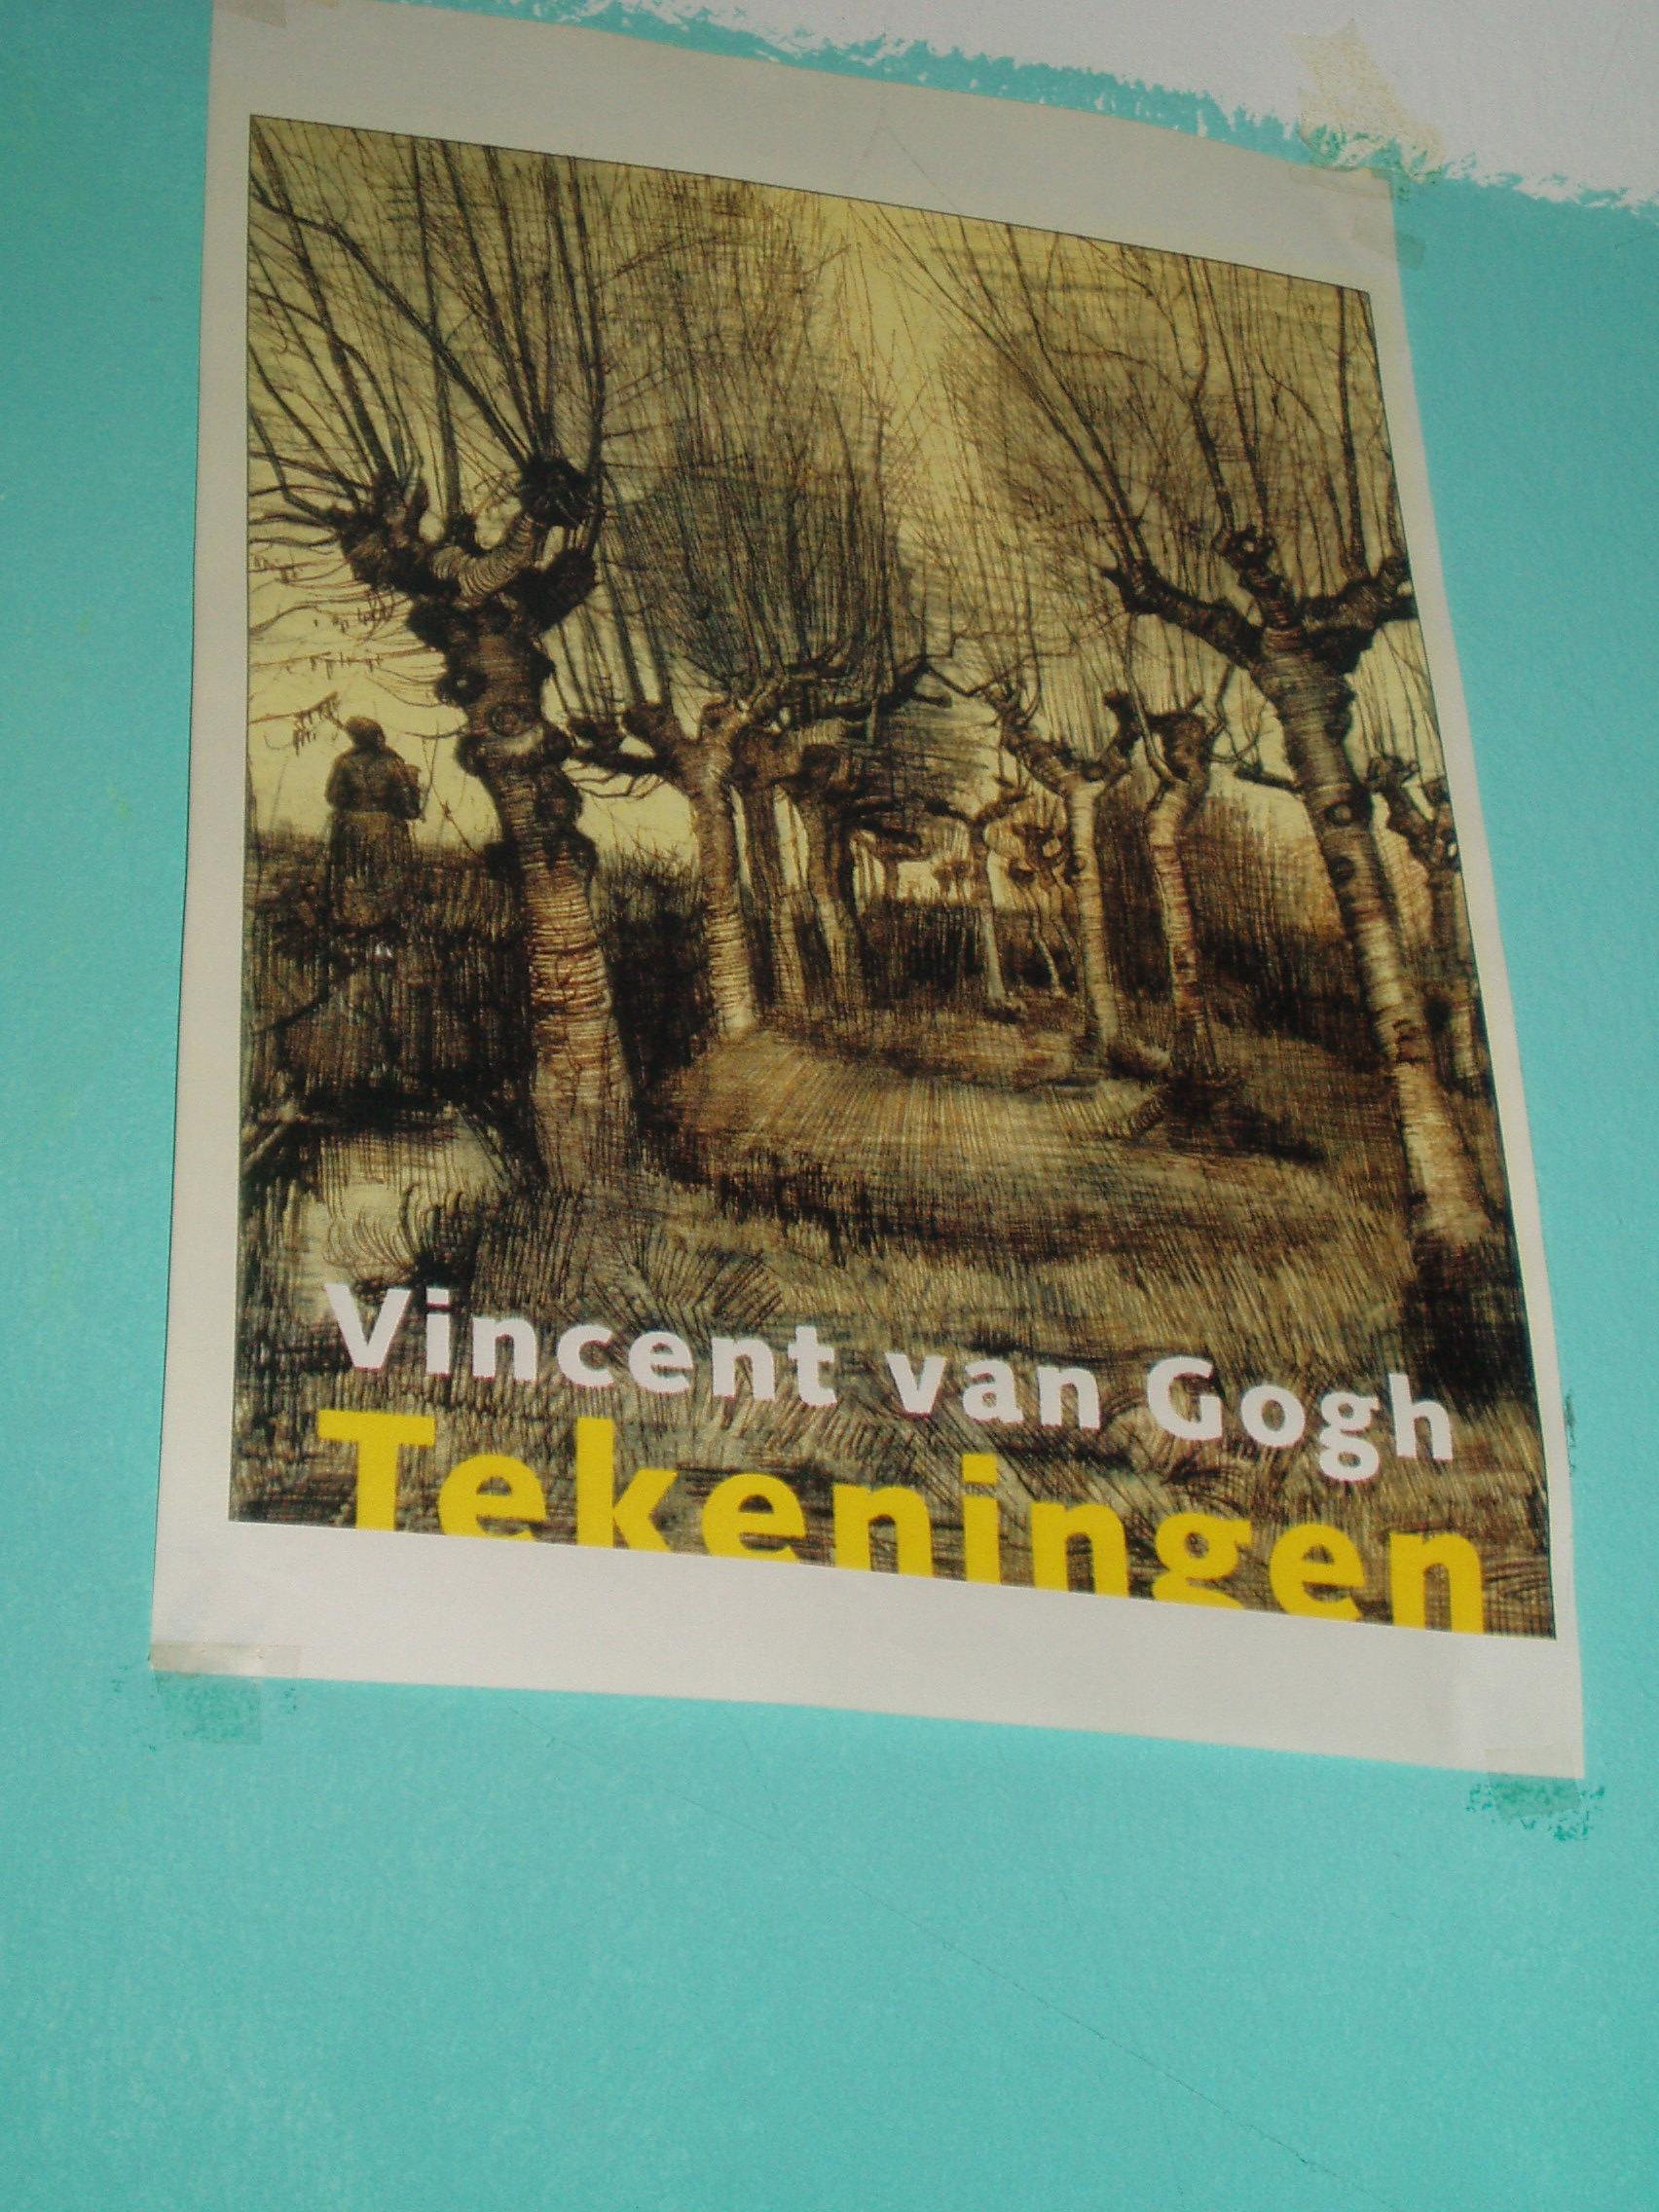 poster van gogh